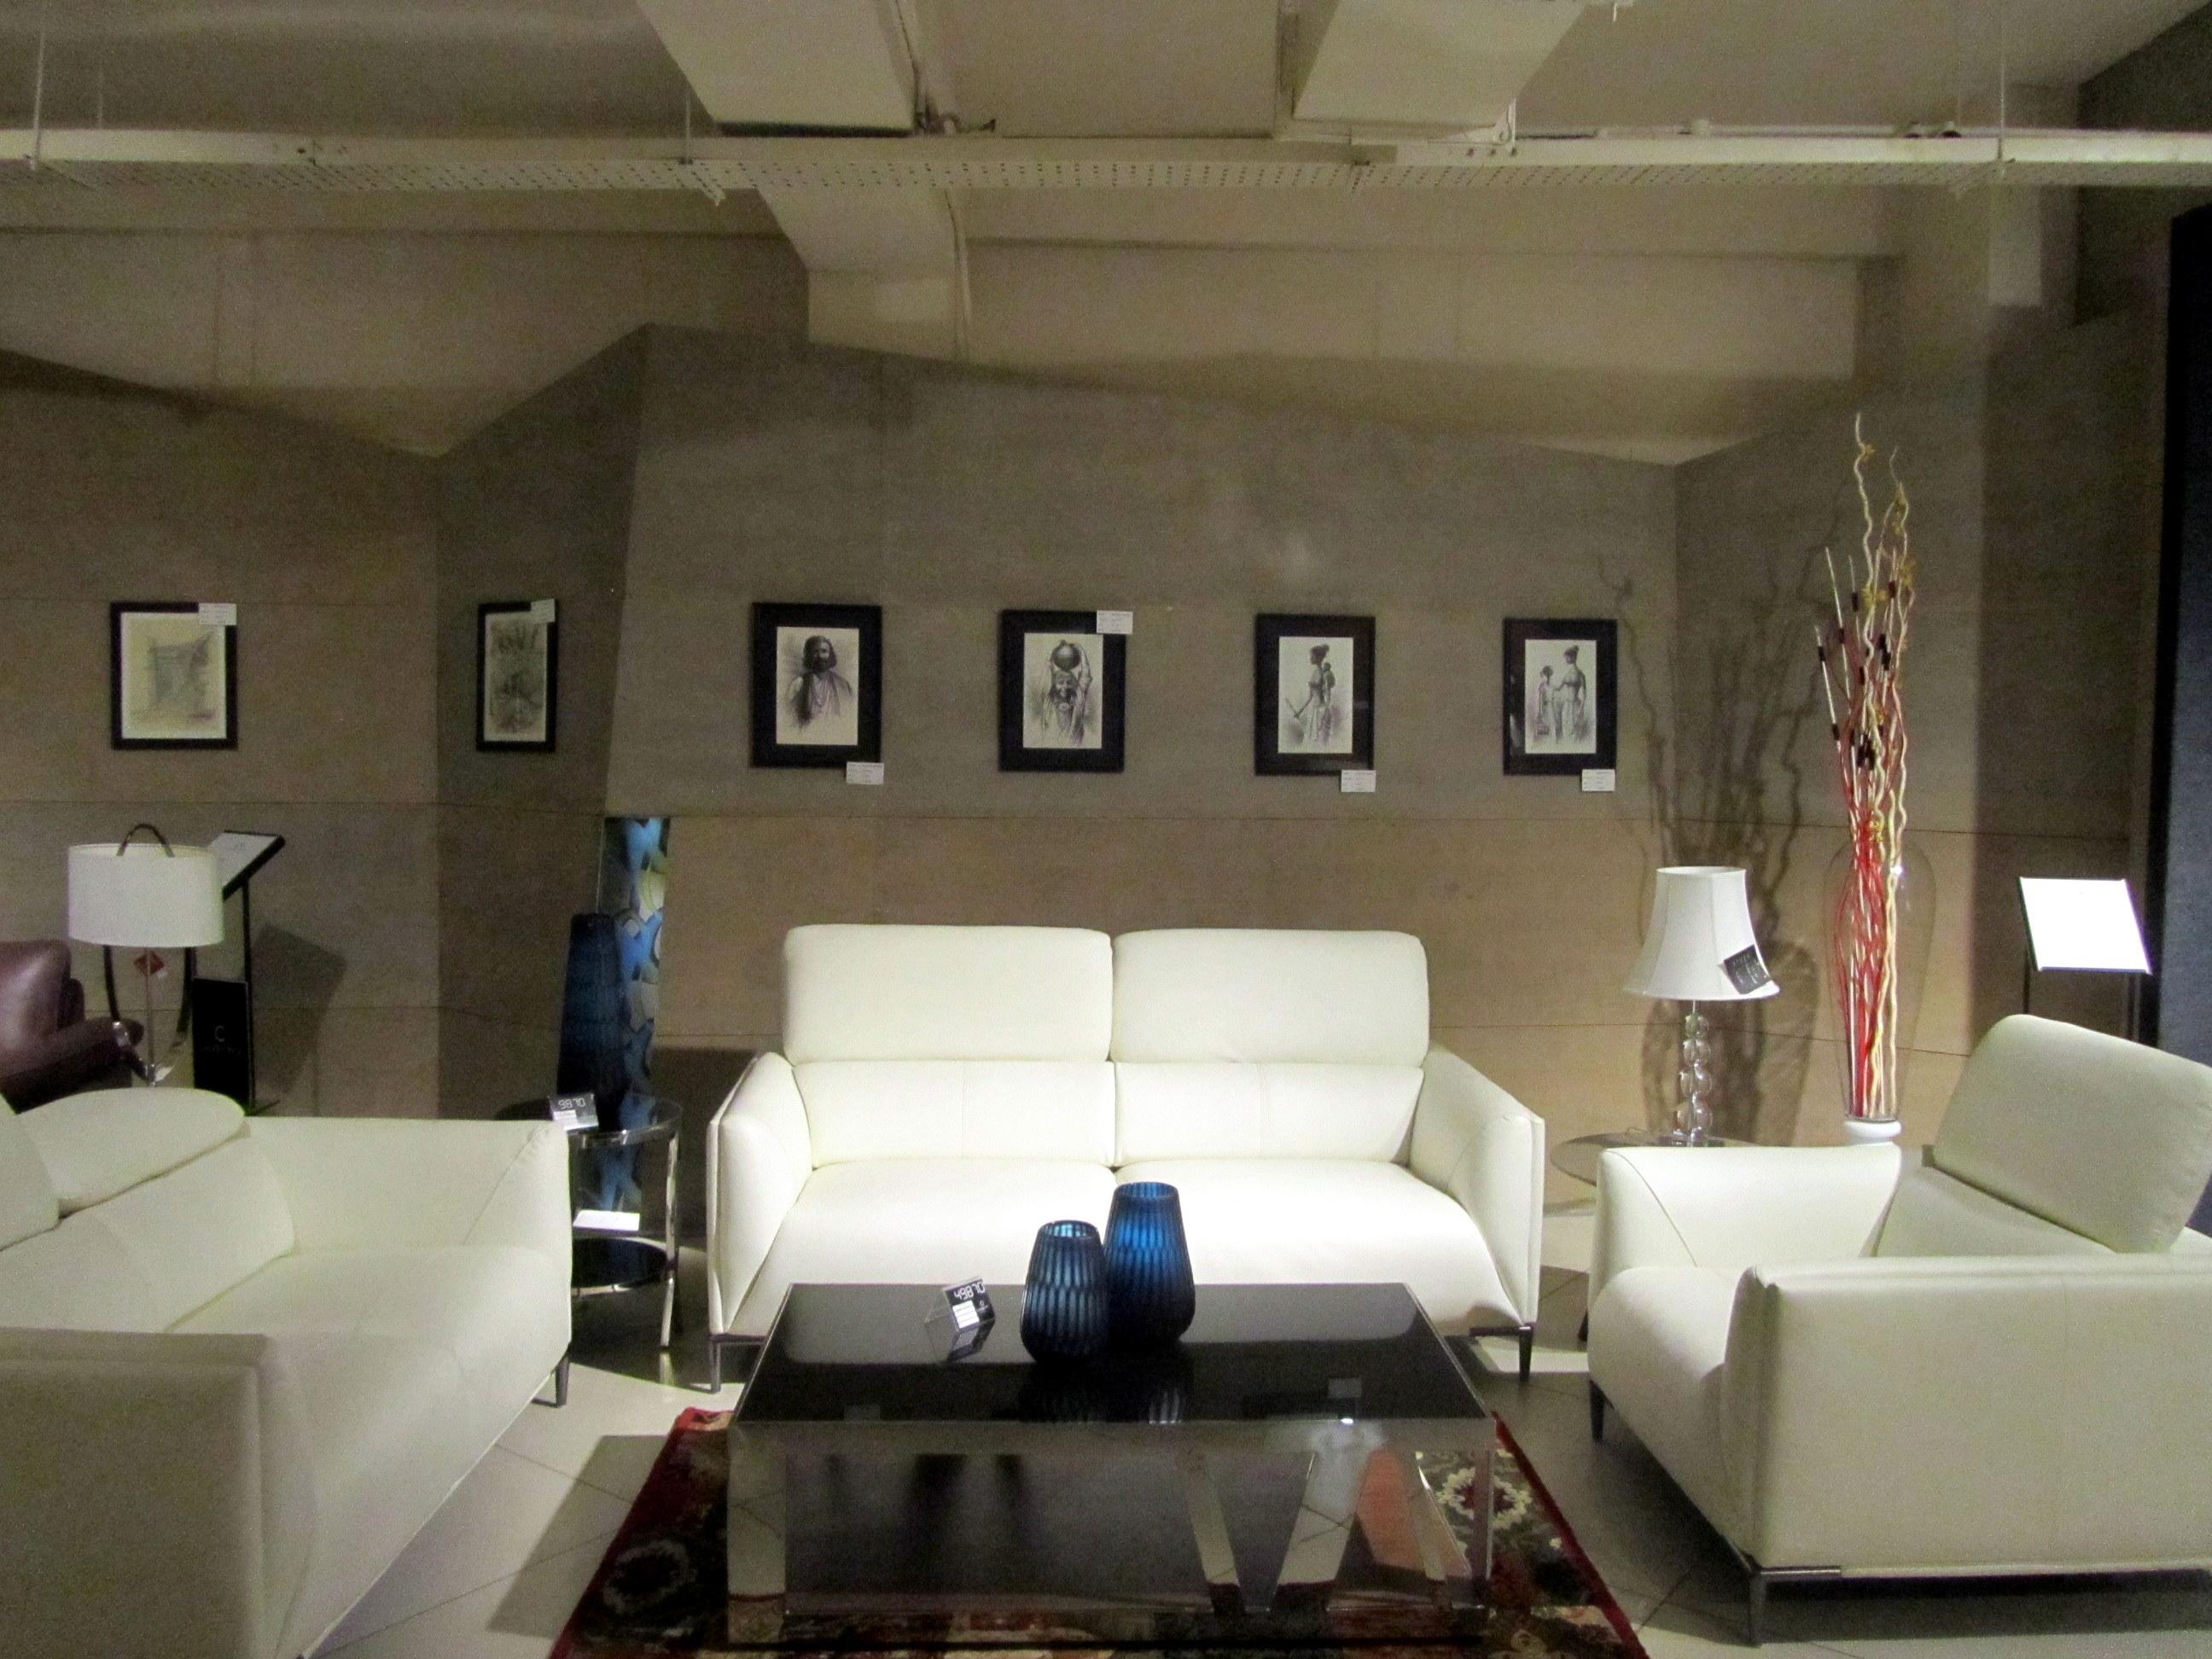 Choicest of Furniture at Cherry pick, Bangalore – Rashminotes | furniture pick